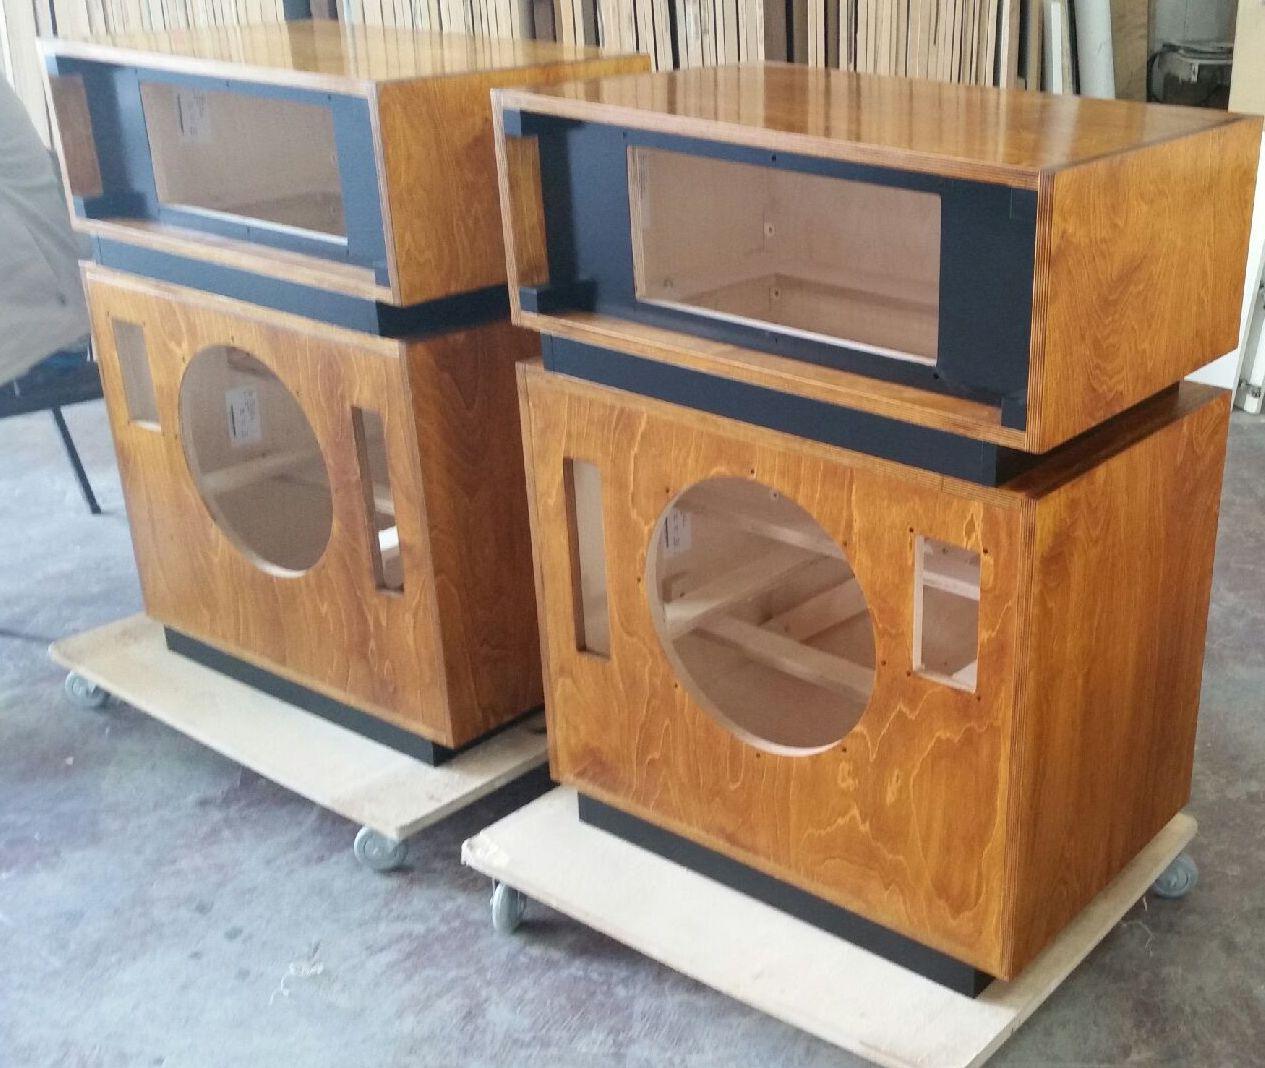 Bespoke speakers - middle